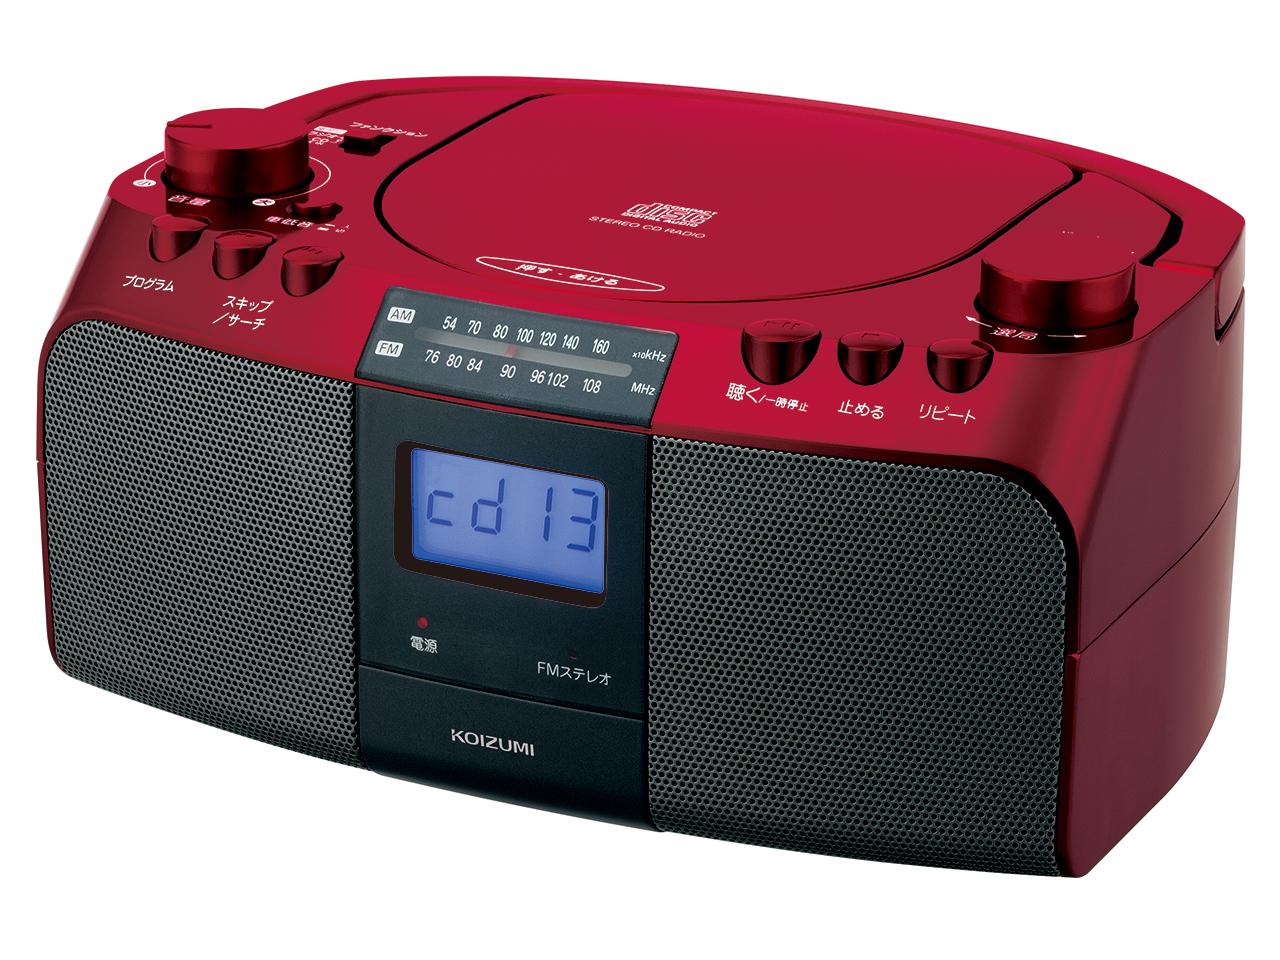 CDラジオ sad 4701 r cdラジカセ cdラジオ オーディオ 音響機器